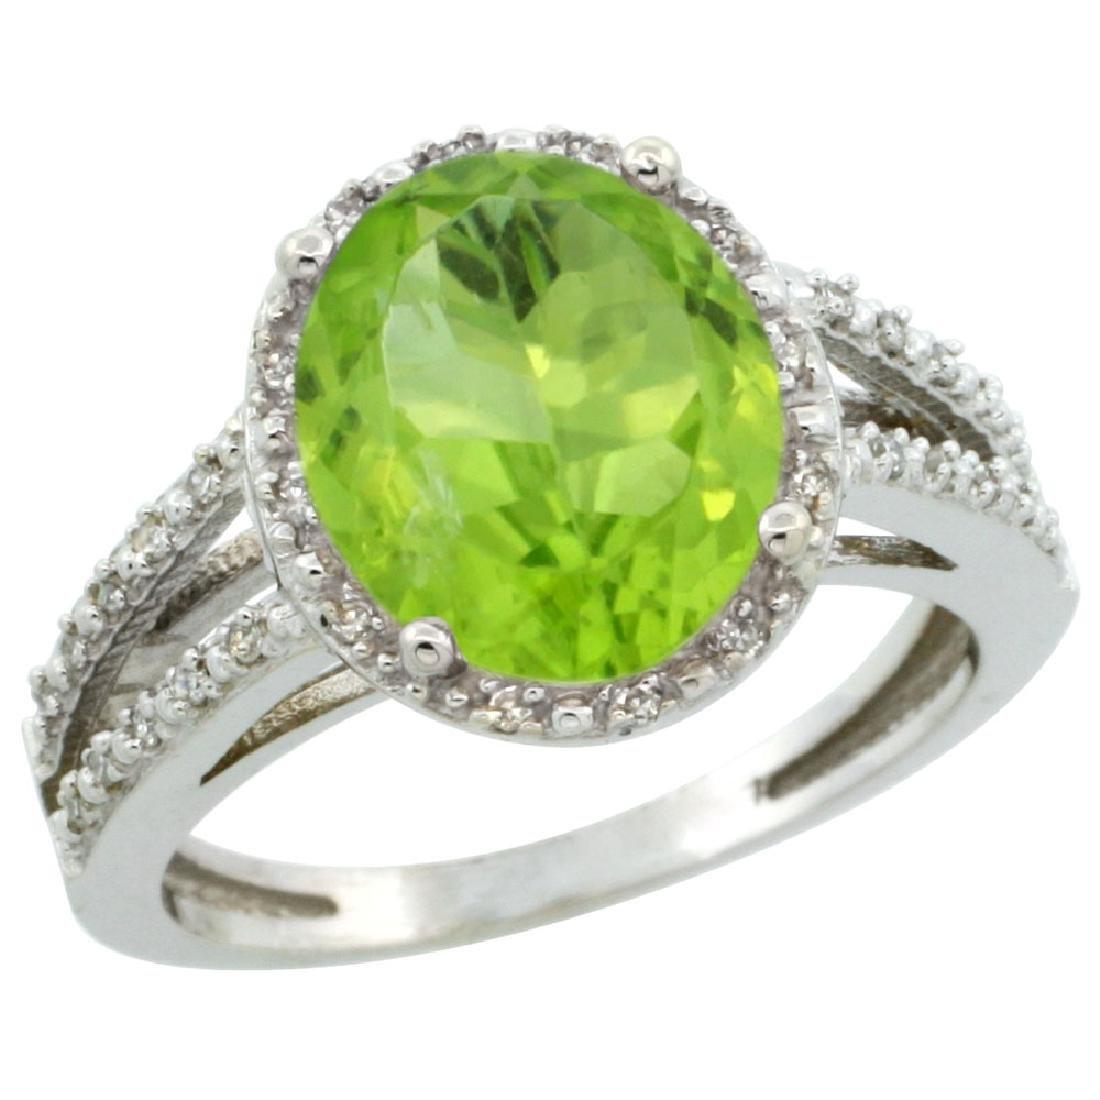 Natural 3.86 ctw Peridot & Diamond Engagement Ring 14K